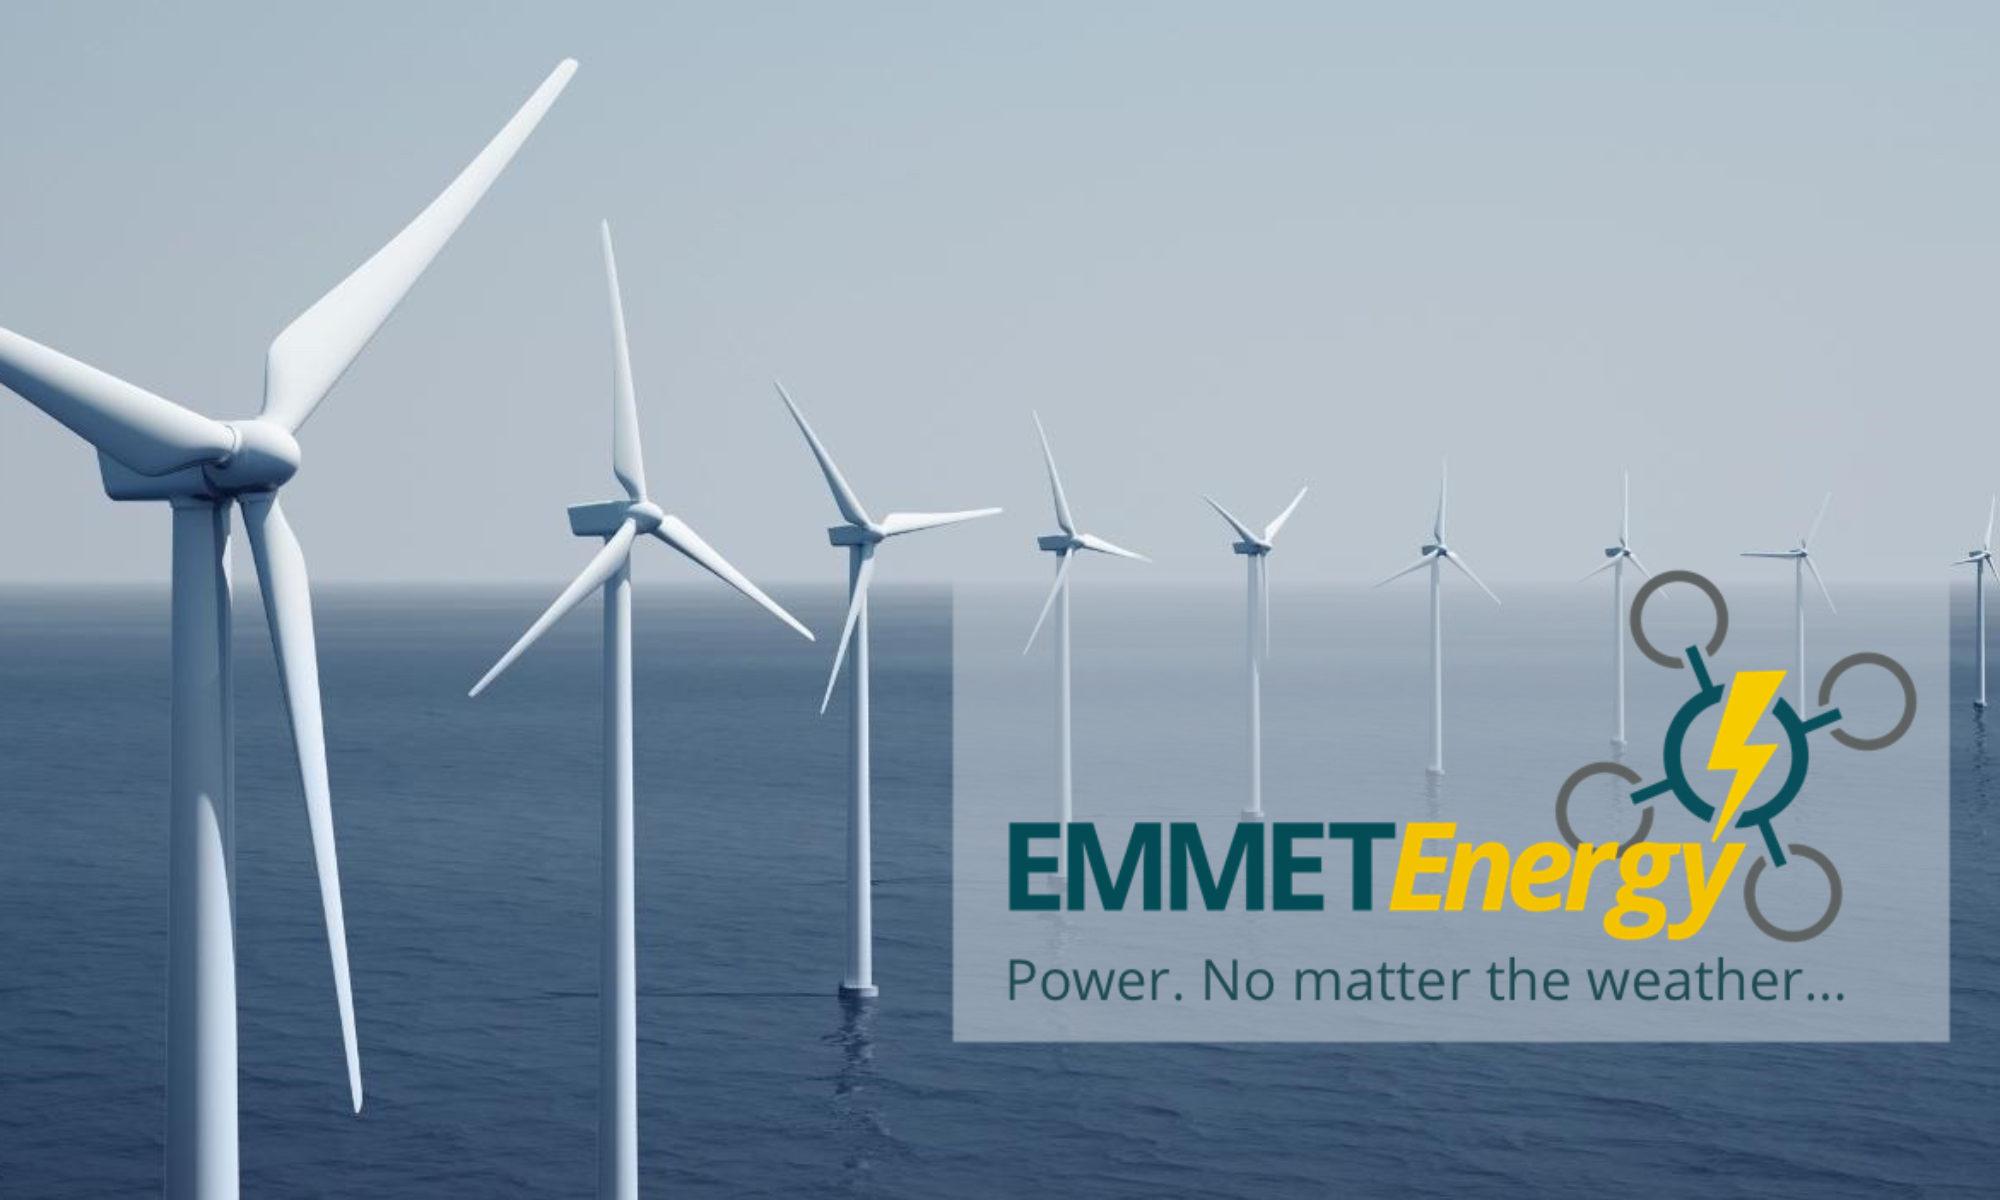 EMMET Energy